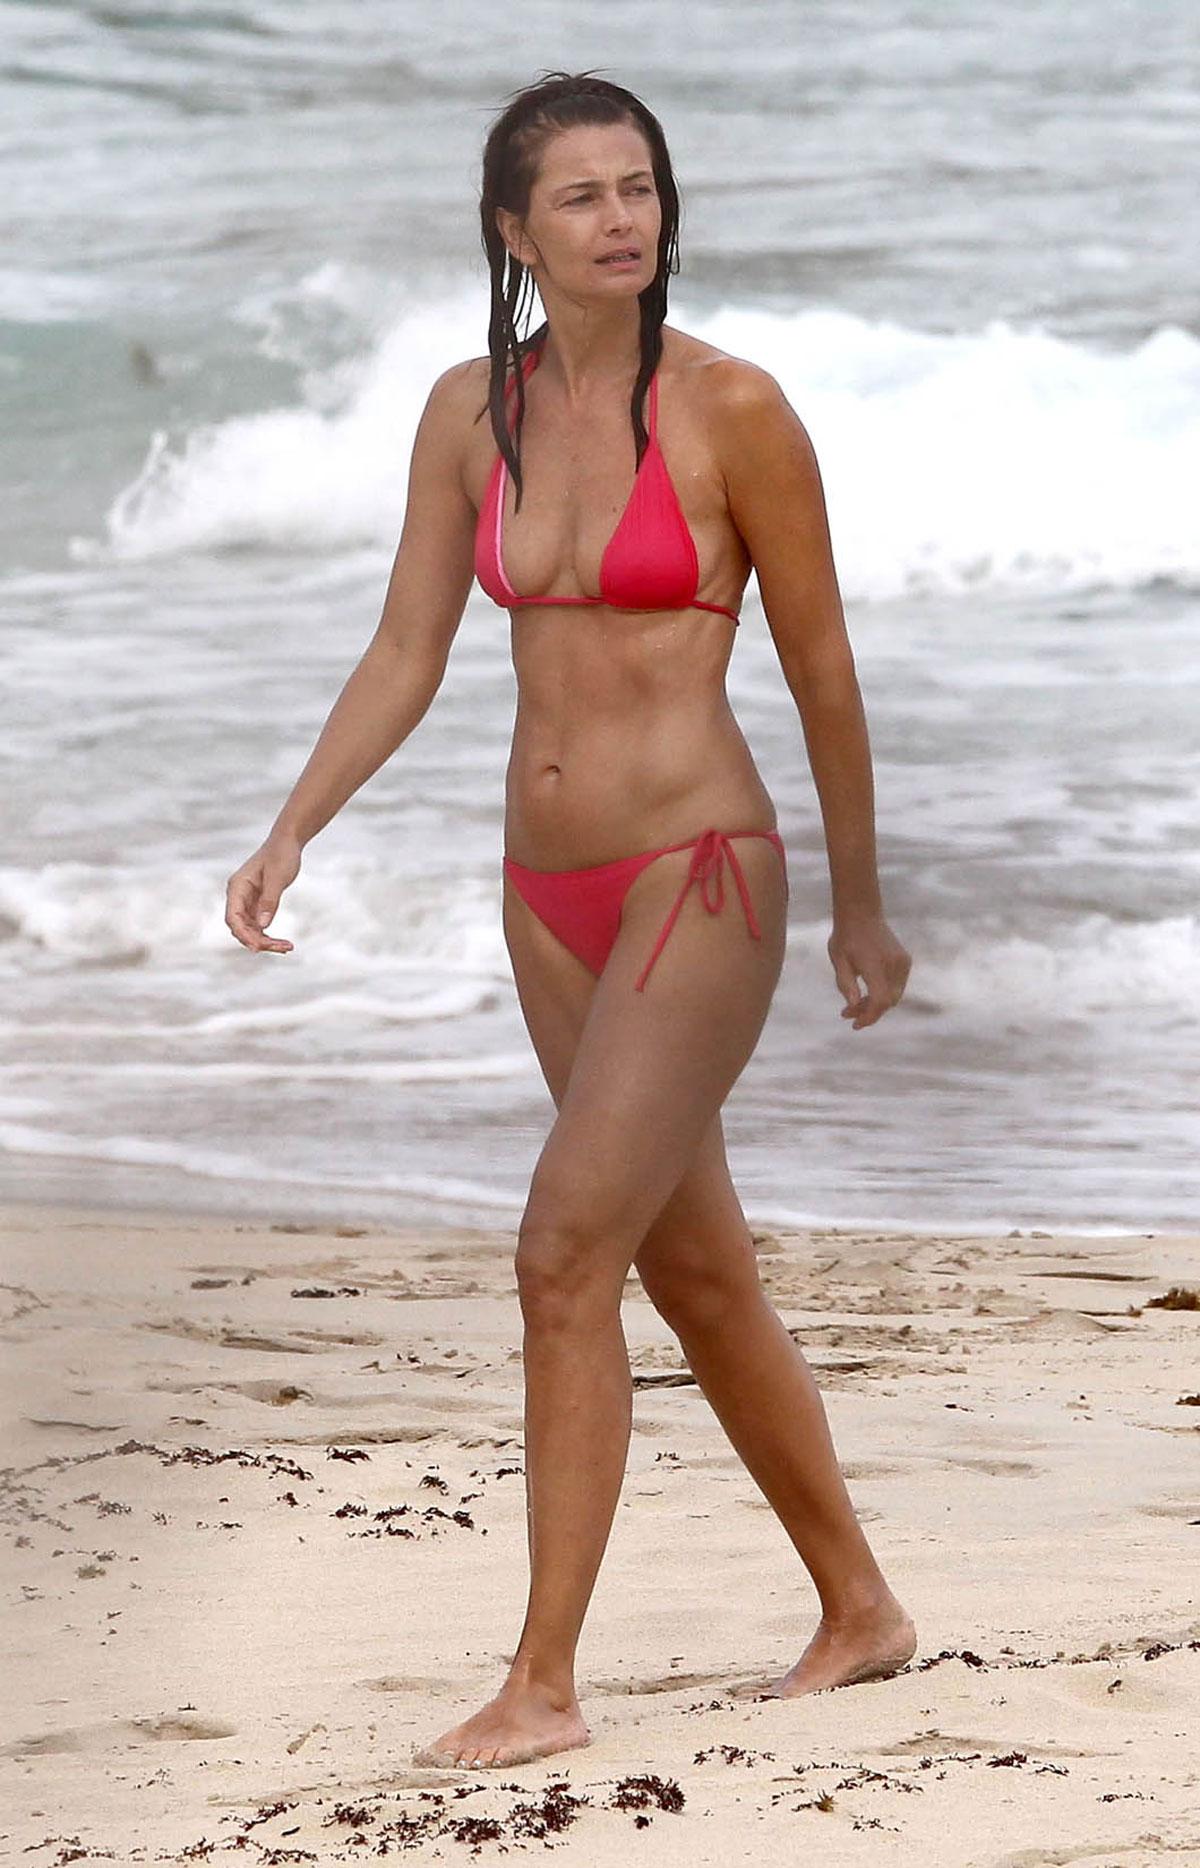 Bikini Paulina Porizkova nude (61 photos), Tits, Cleavage, Instagram, braless 2006